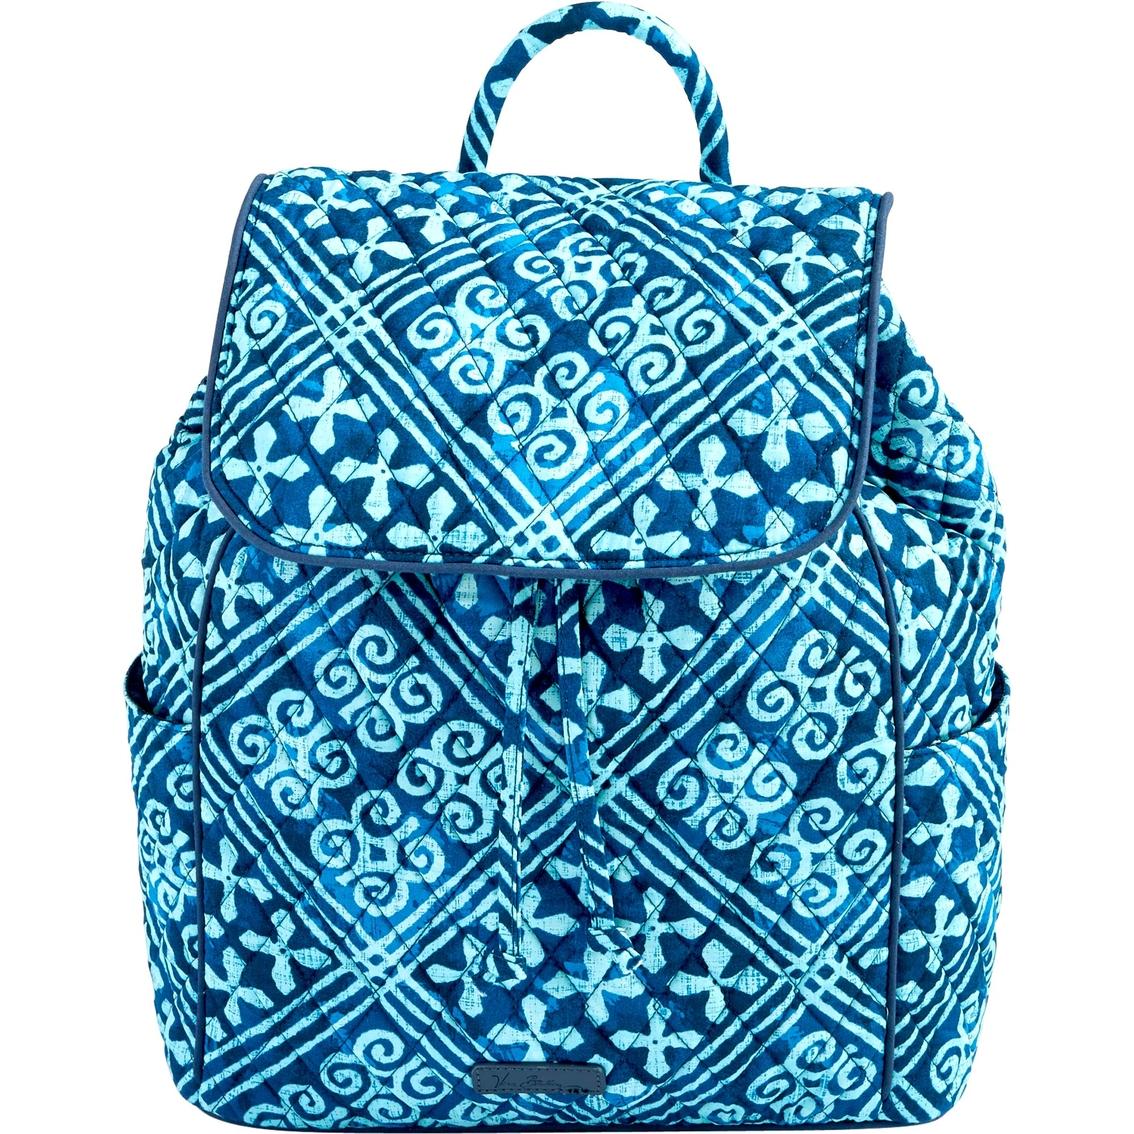 46f948a3121a Vera Bradley Drawstring Backpack